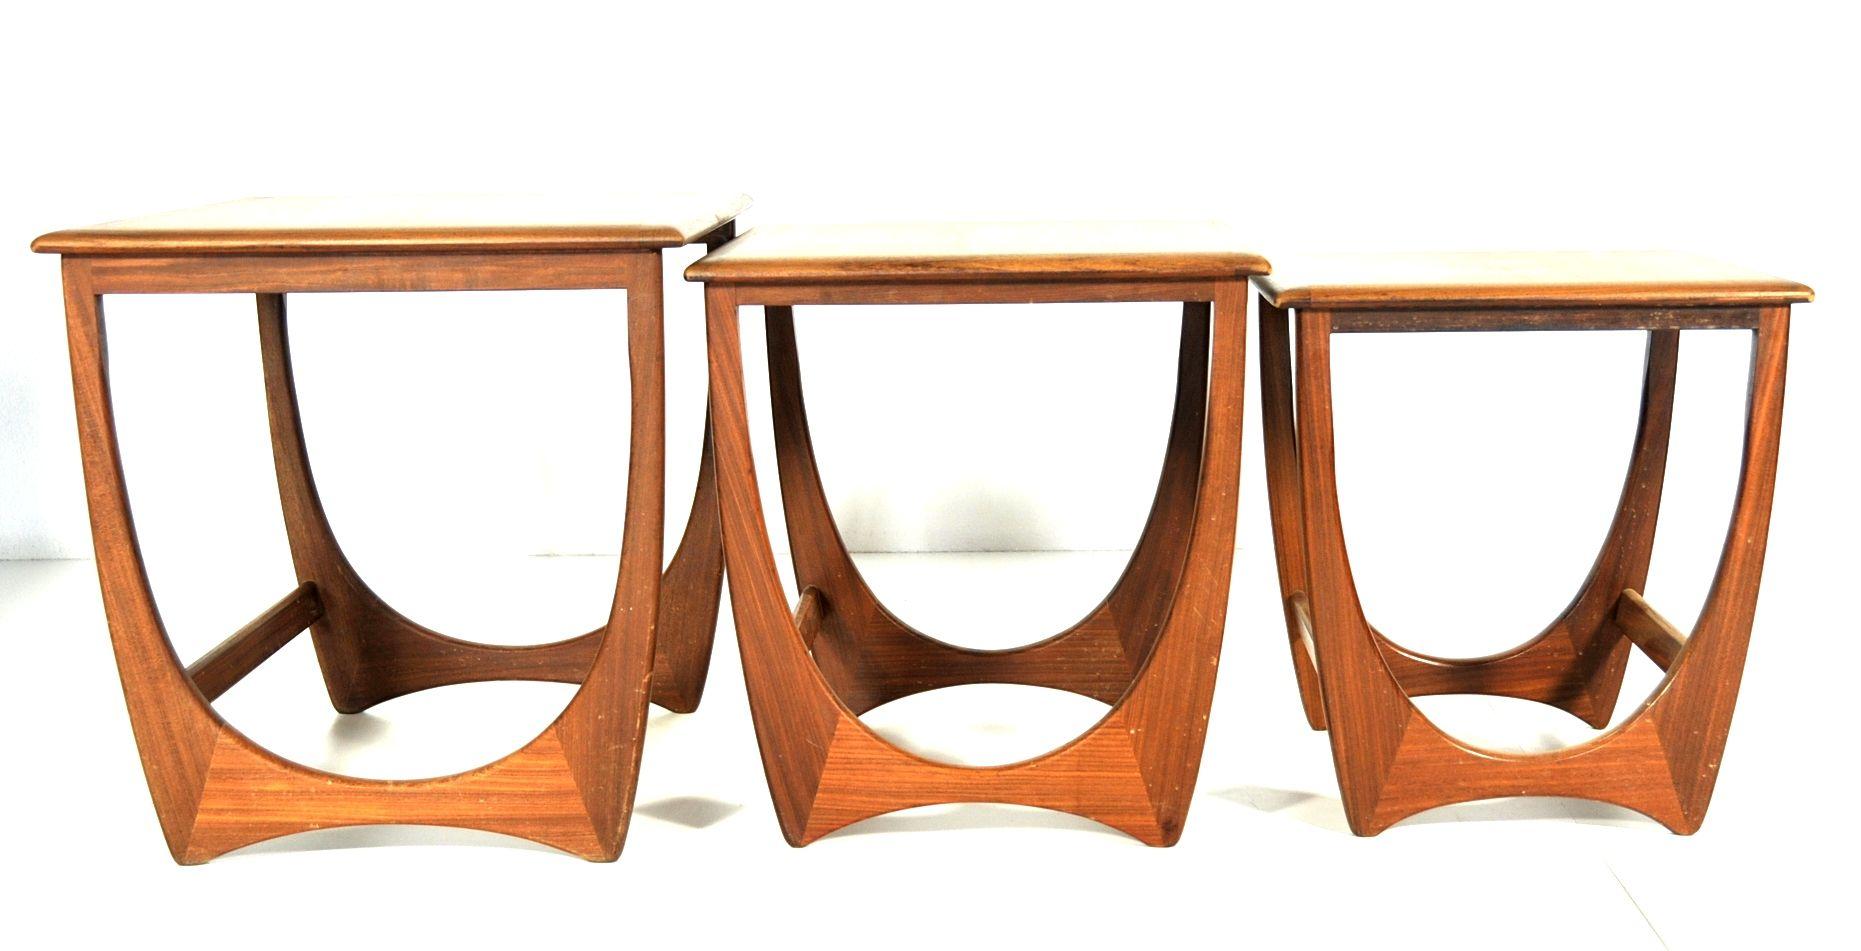 tables gigogne astro series de g-plan, set de 3 en vente sur pamono